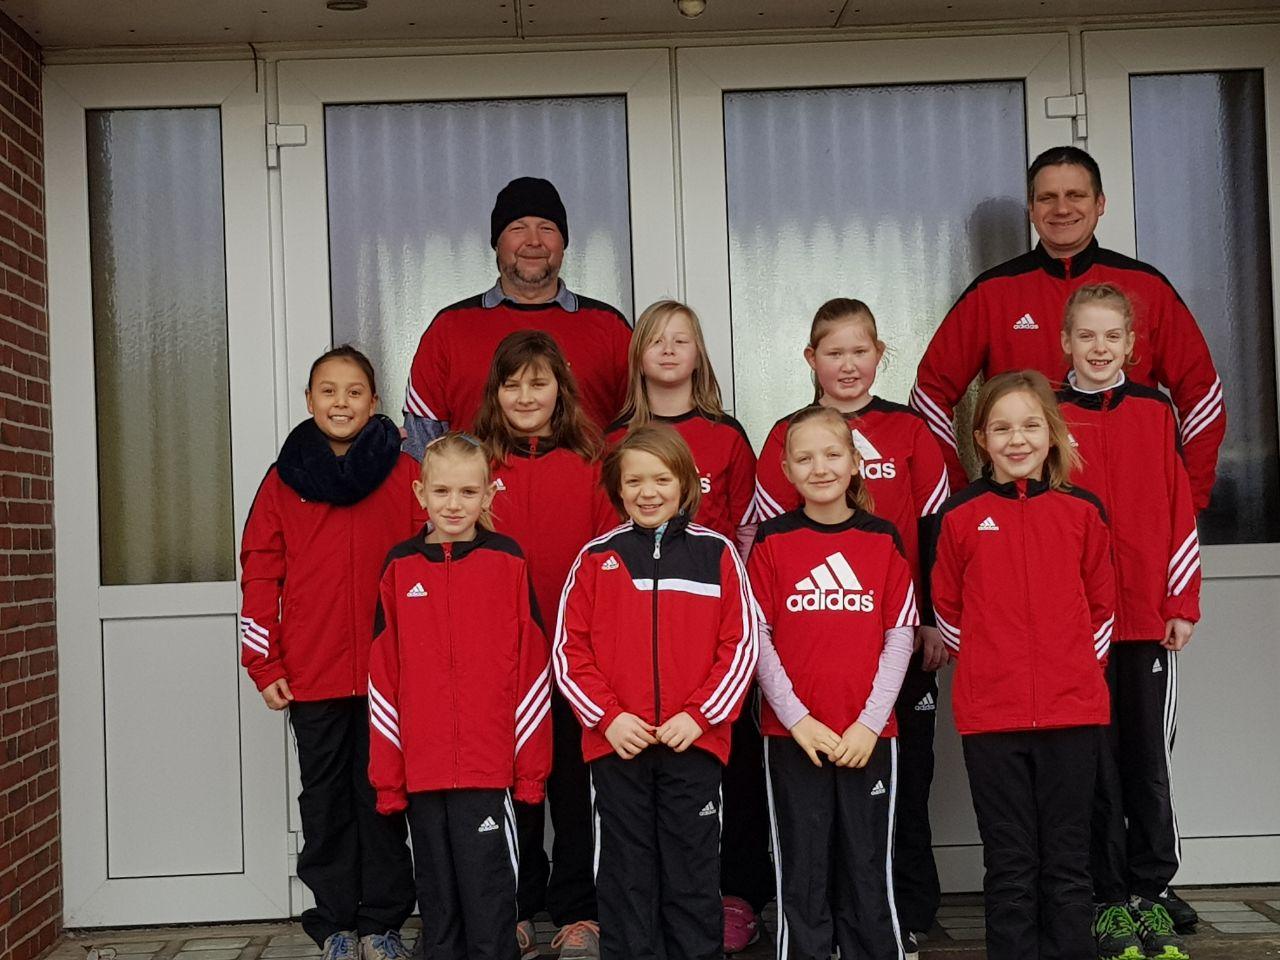 Wbl. Jugend E 2017-2018